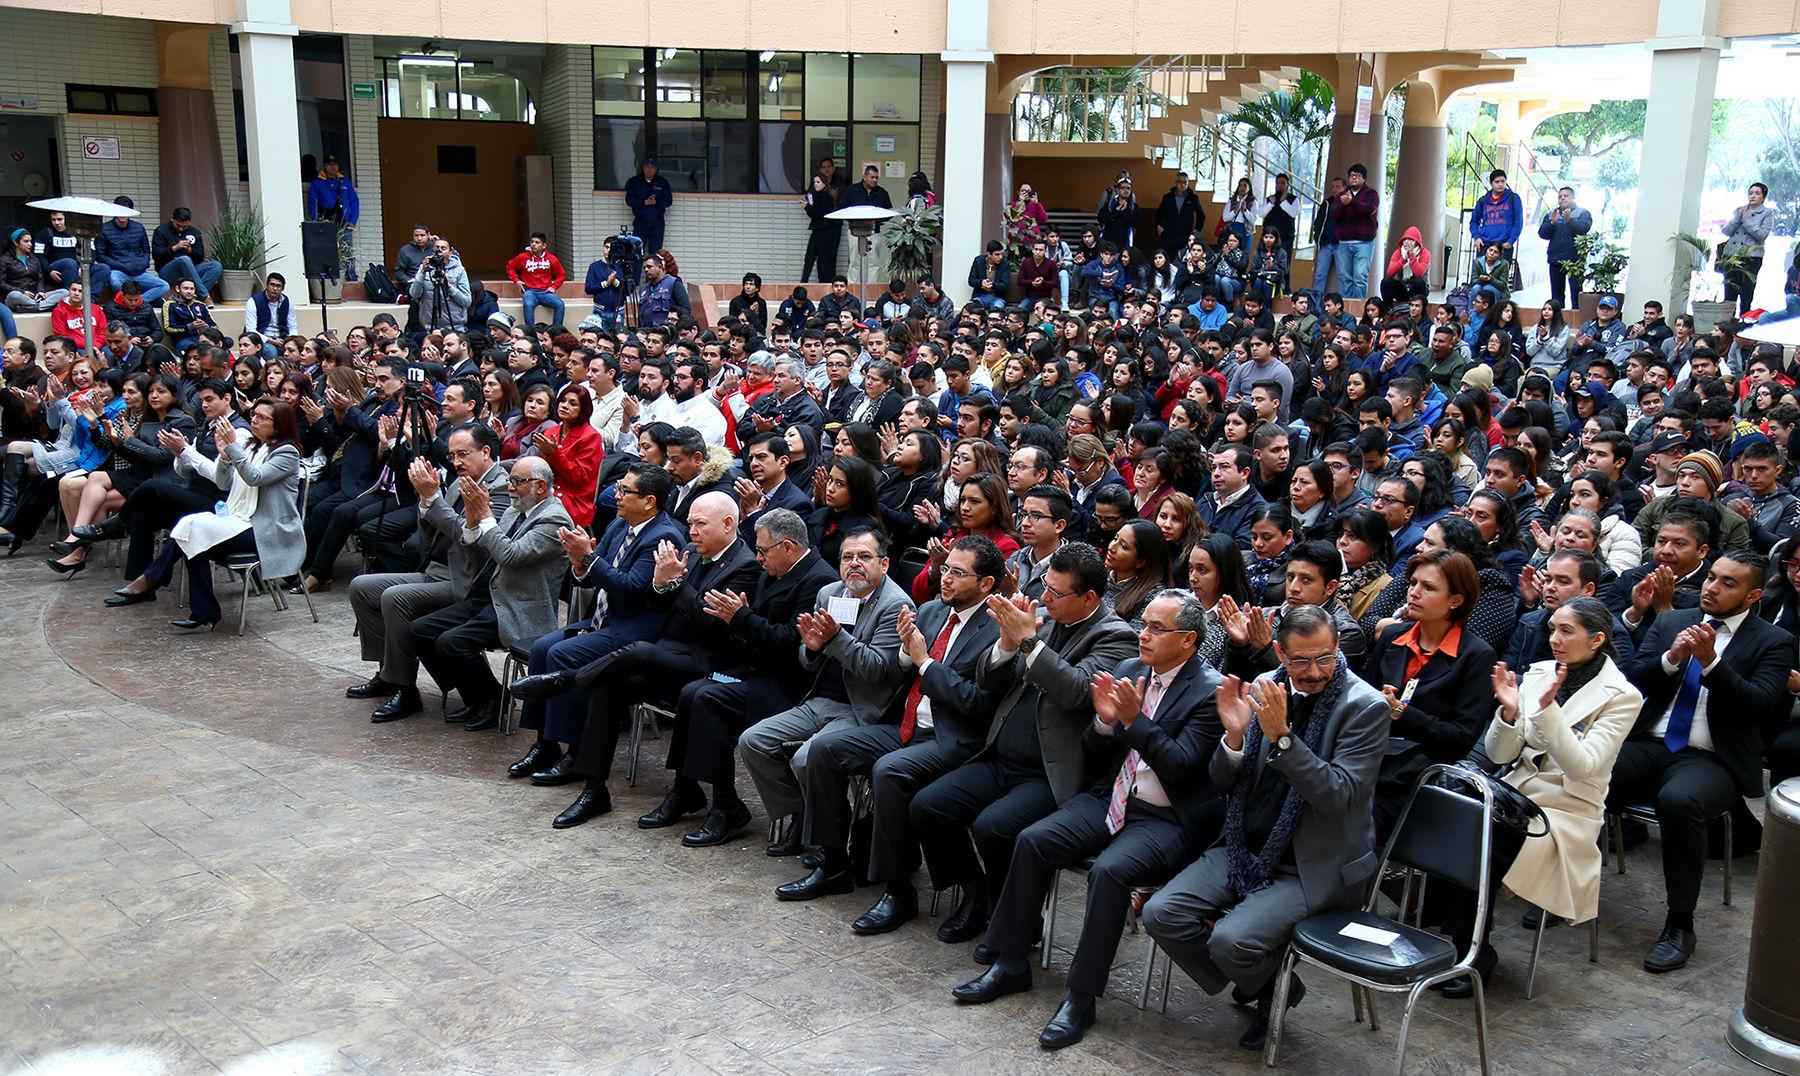 Docentes e investigadores, así como estudiantes, se dieron cita para atestiguar la ceremonia